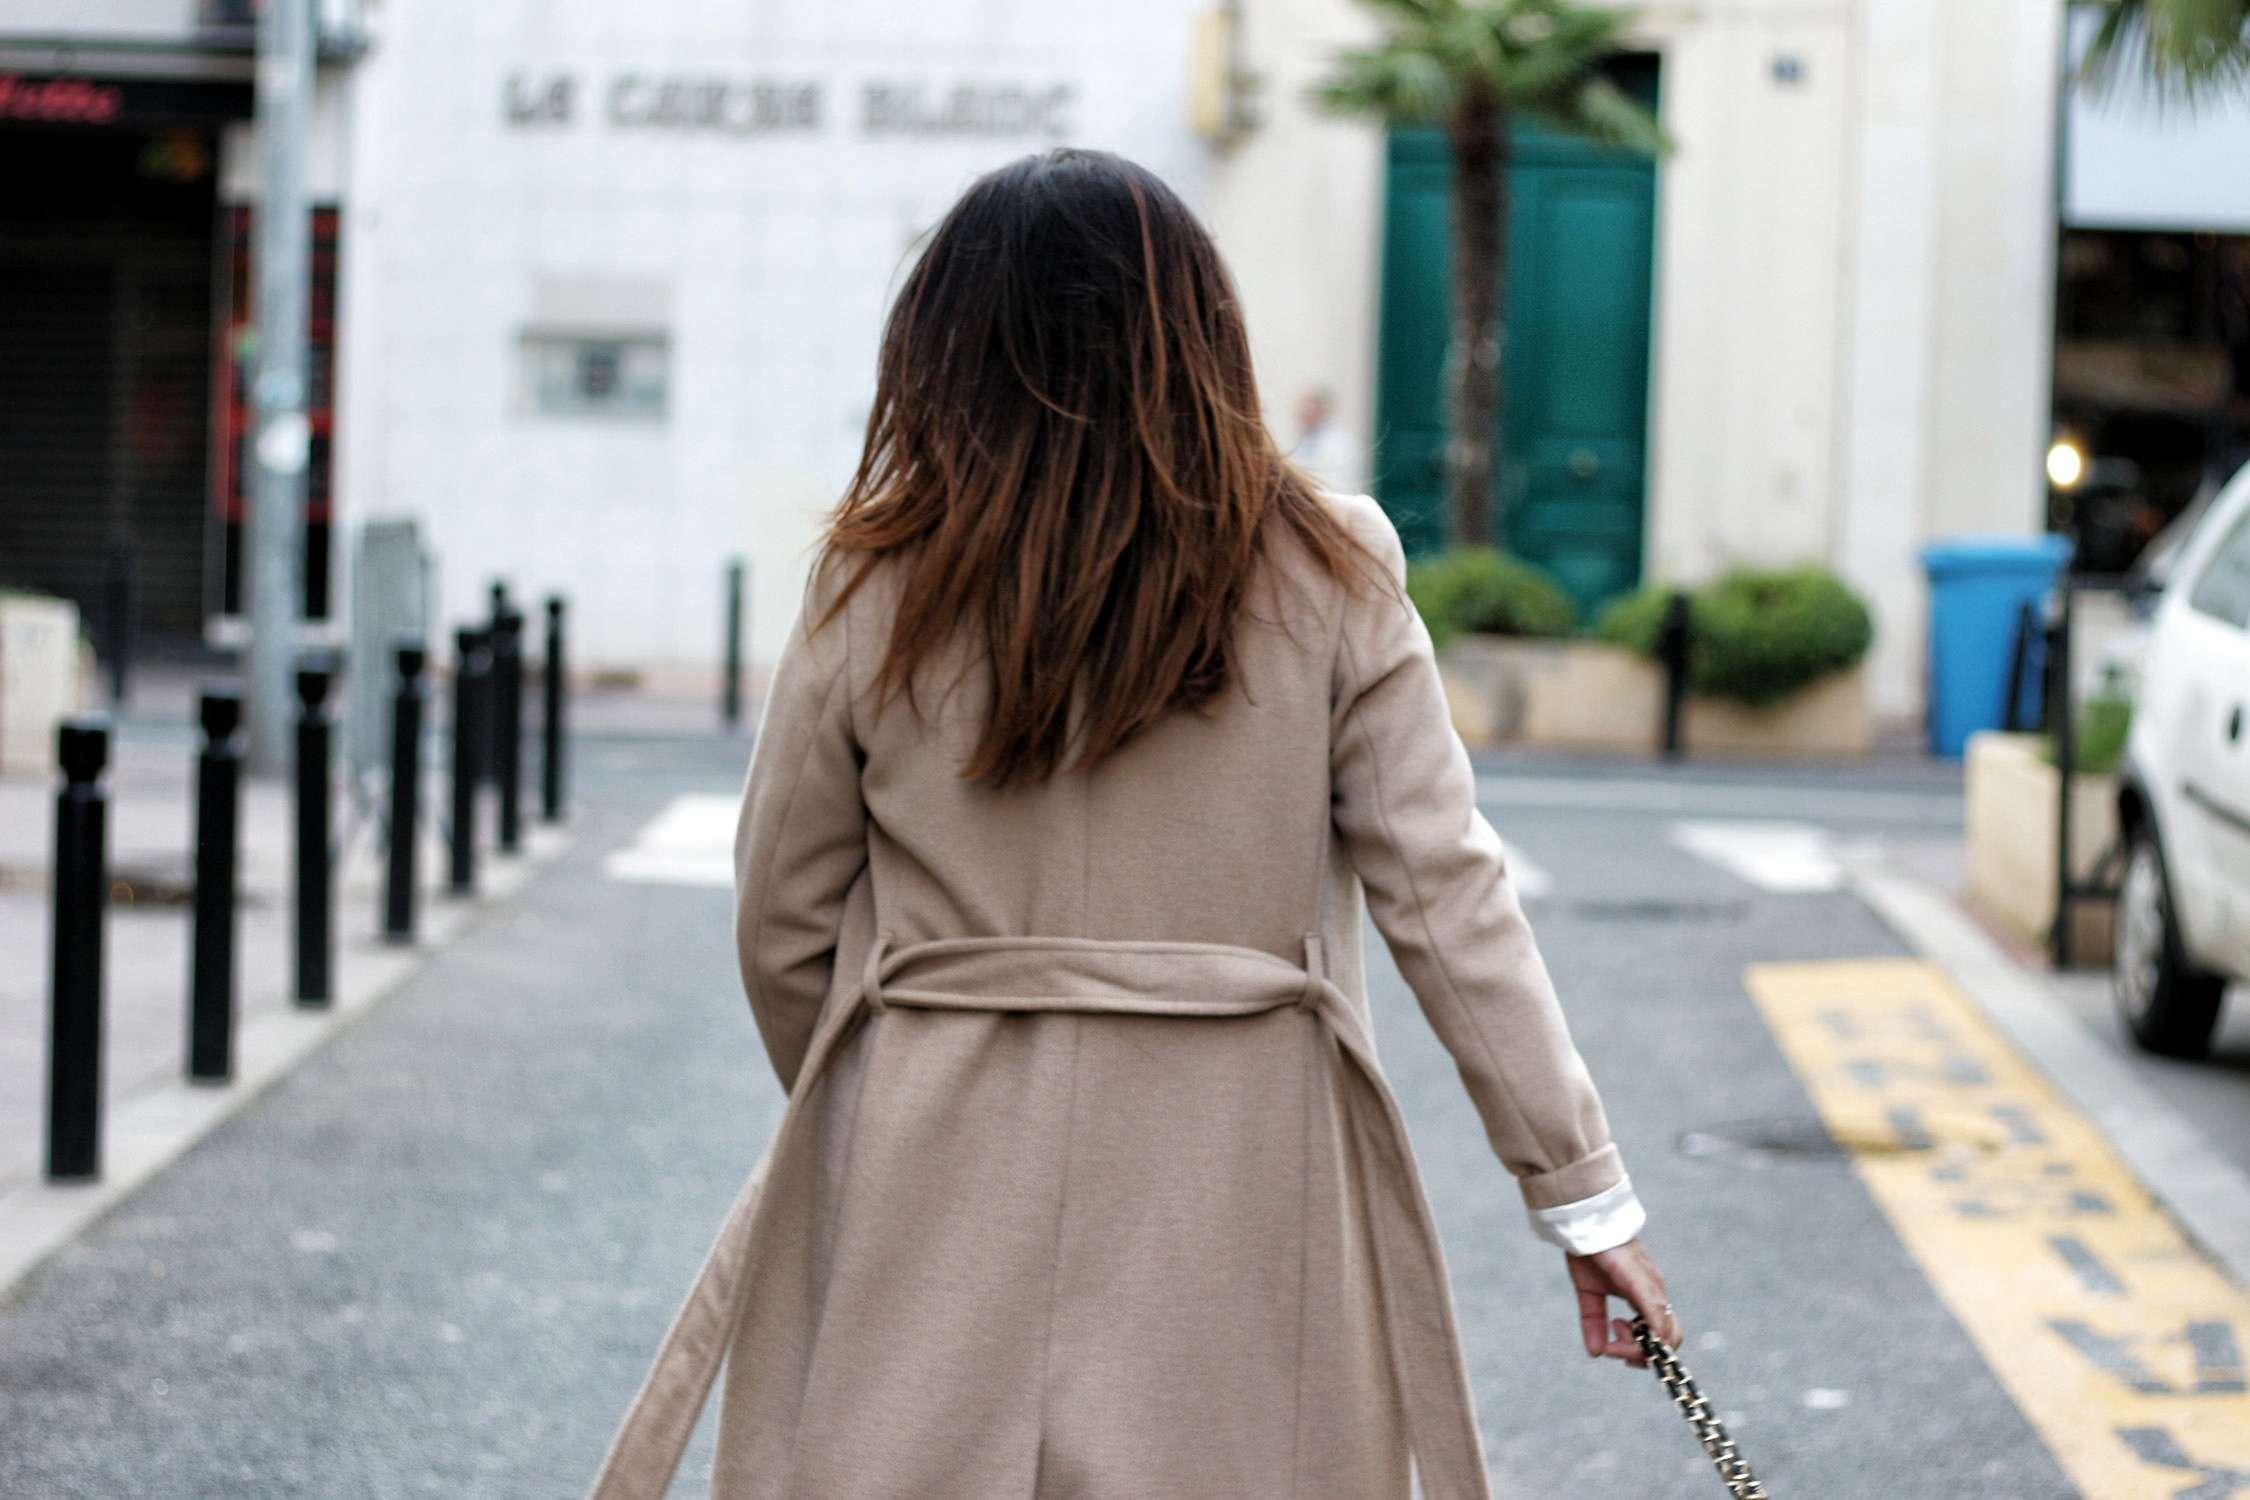 manteau camel, camel, sac inspi chanel, manteau h&m, zara, sheinside, pantalon simili cuir, pantalon simili zara, the green ananas, blogueuse mode, fashion blogger, chemise leopard, leopard